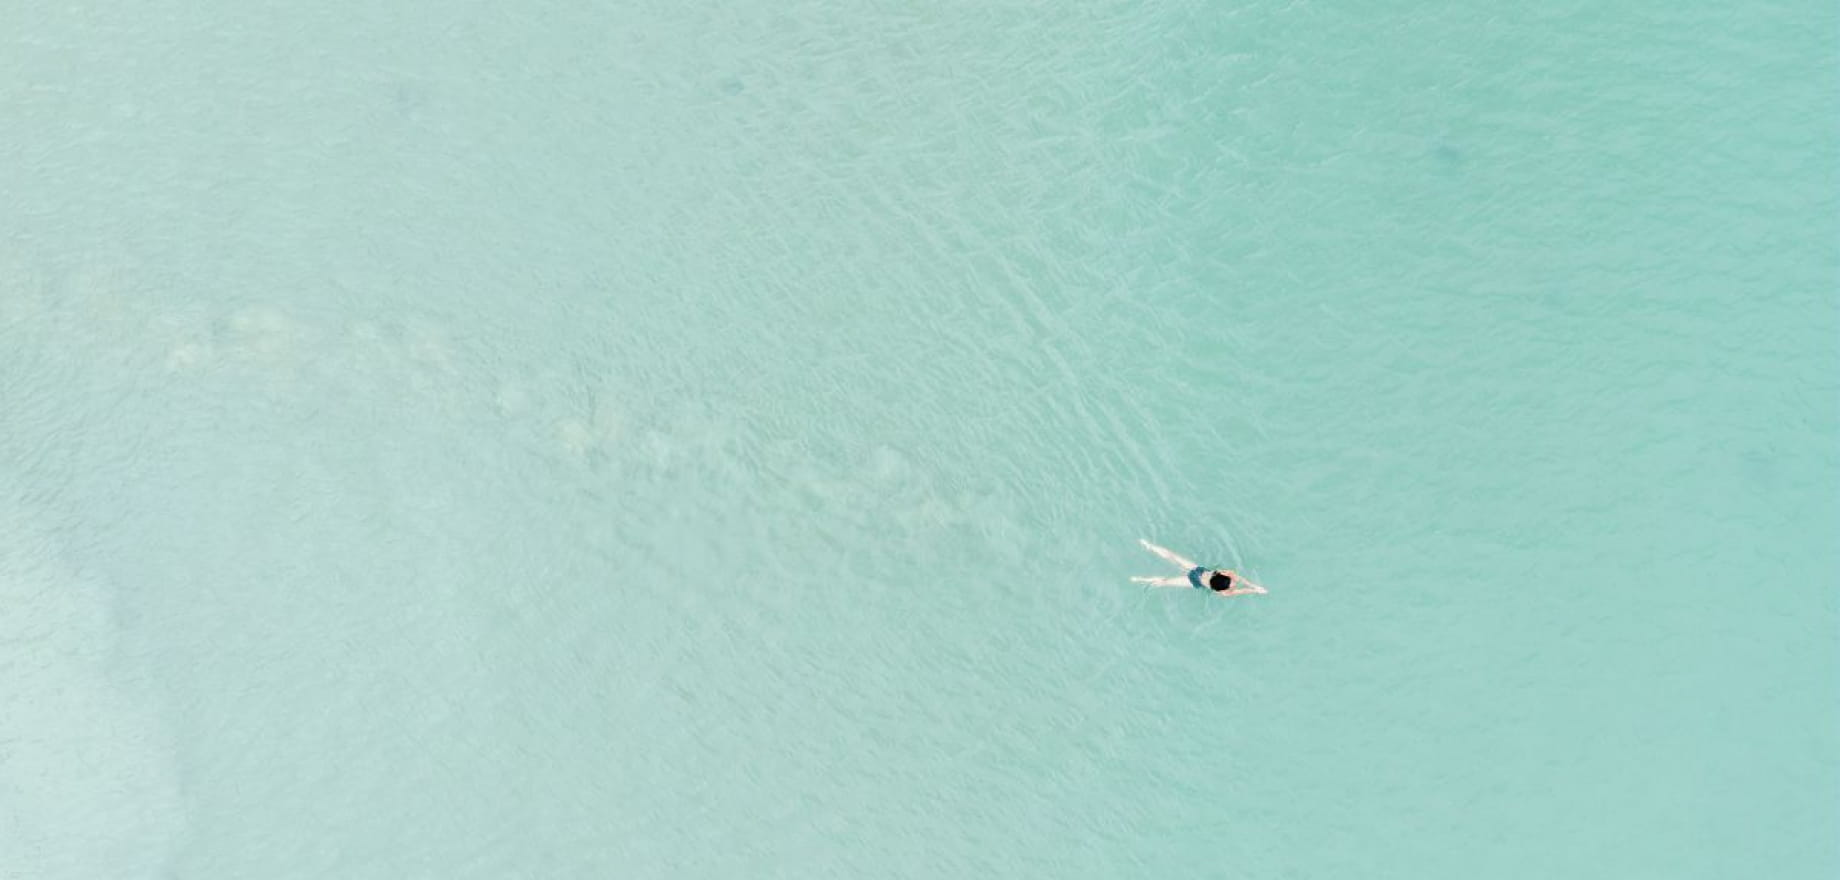 Martin plage, Plerin - Baignade - Vue drone